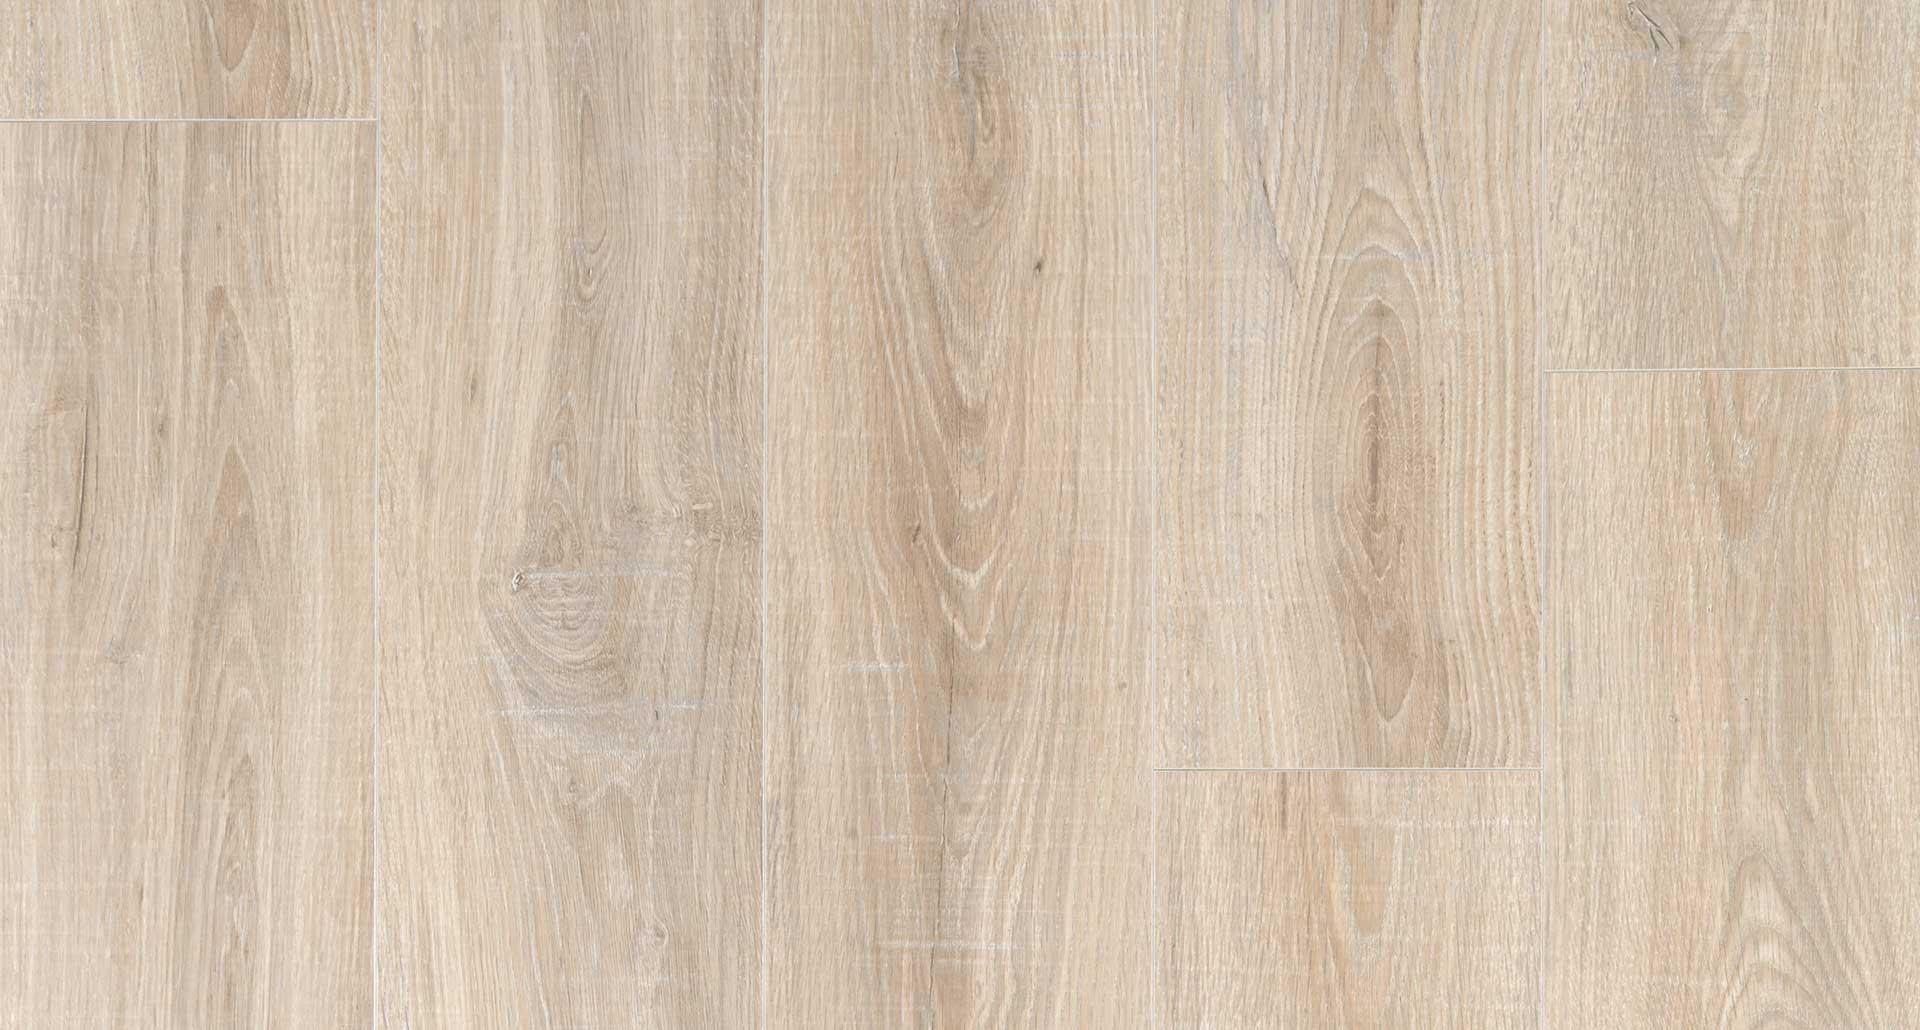 Laminate Flooring Texture Oak San Marco Pergo Max